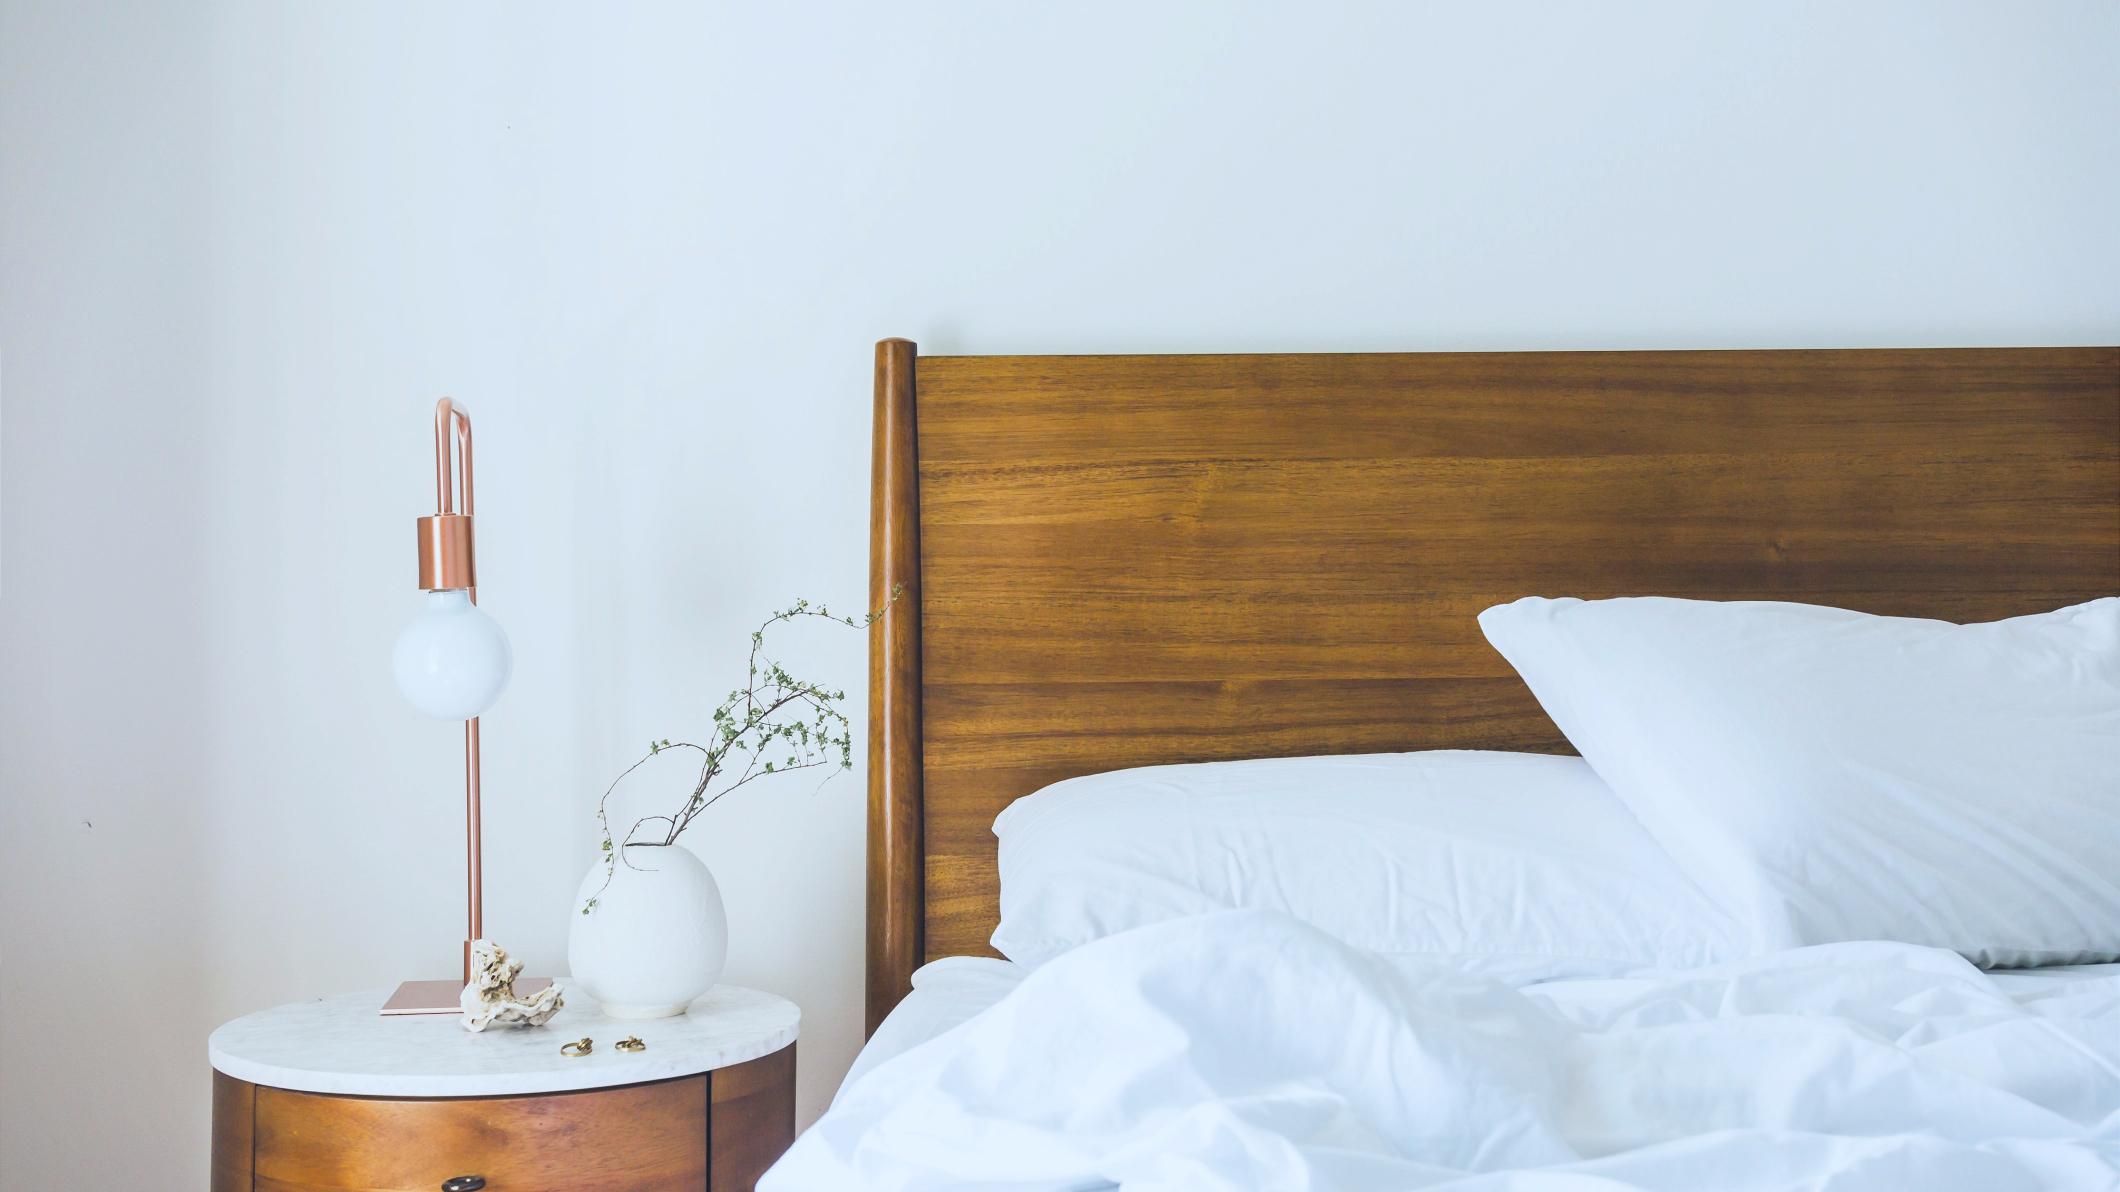 A bedside